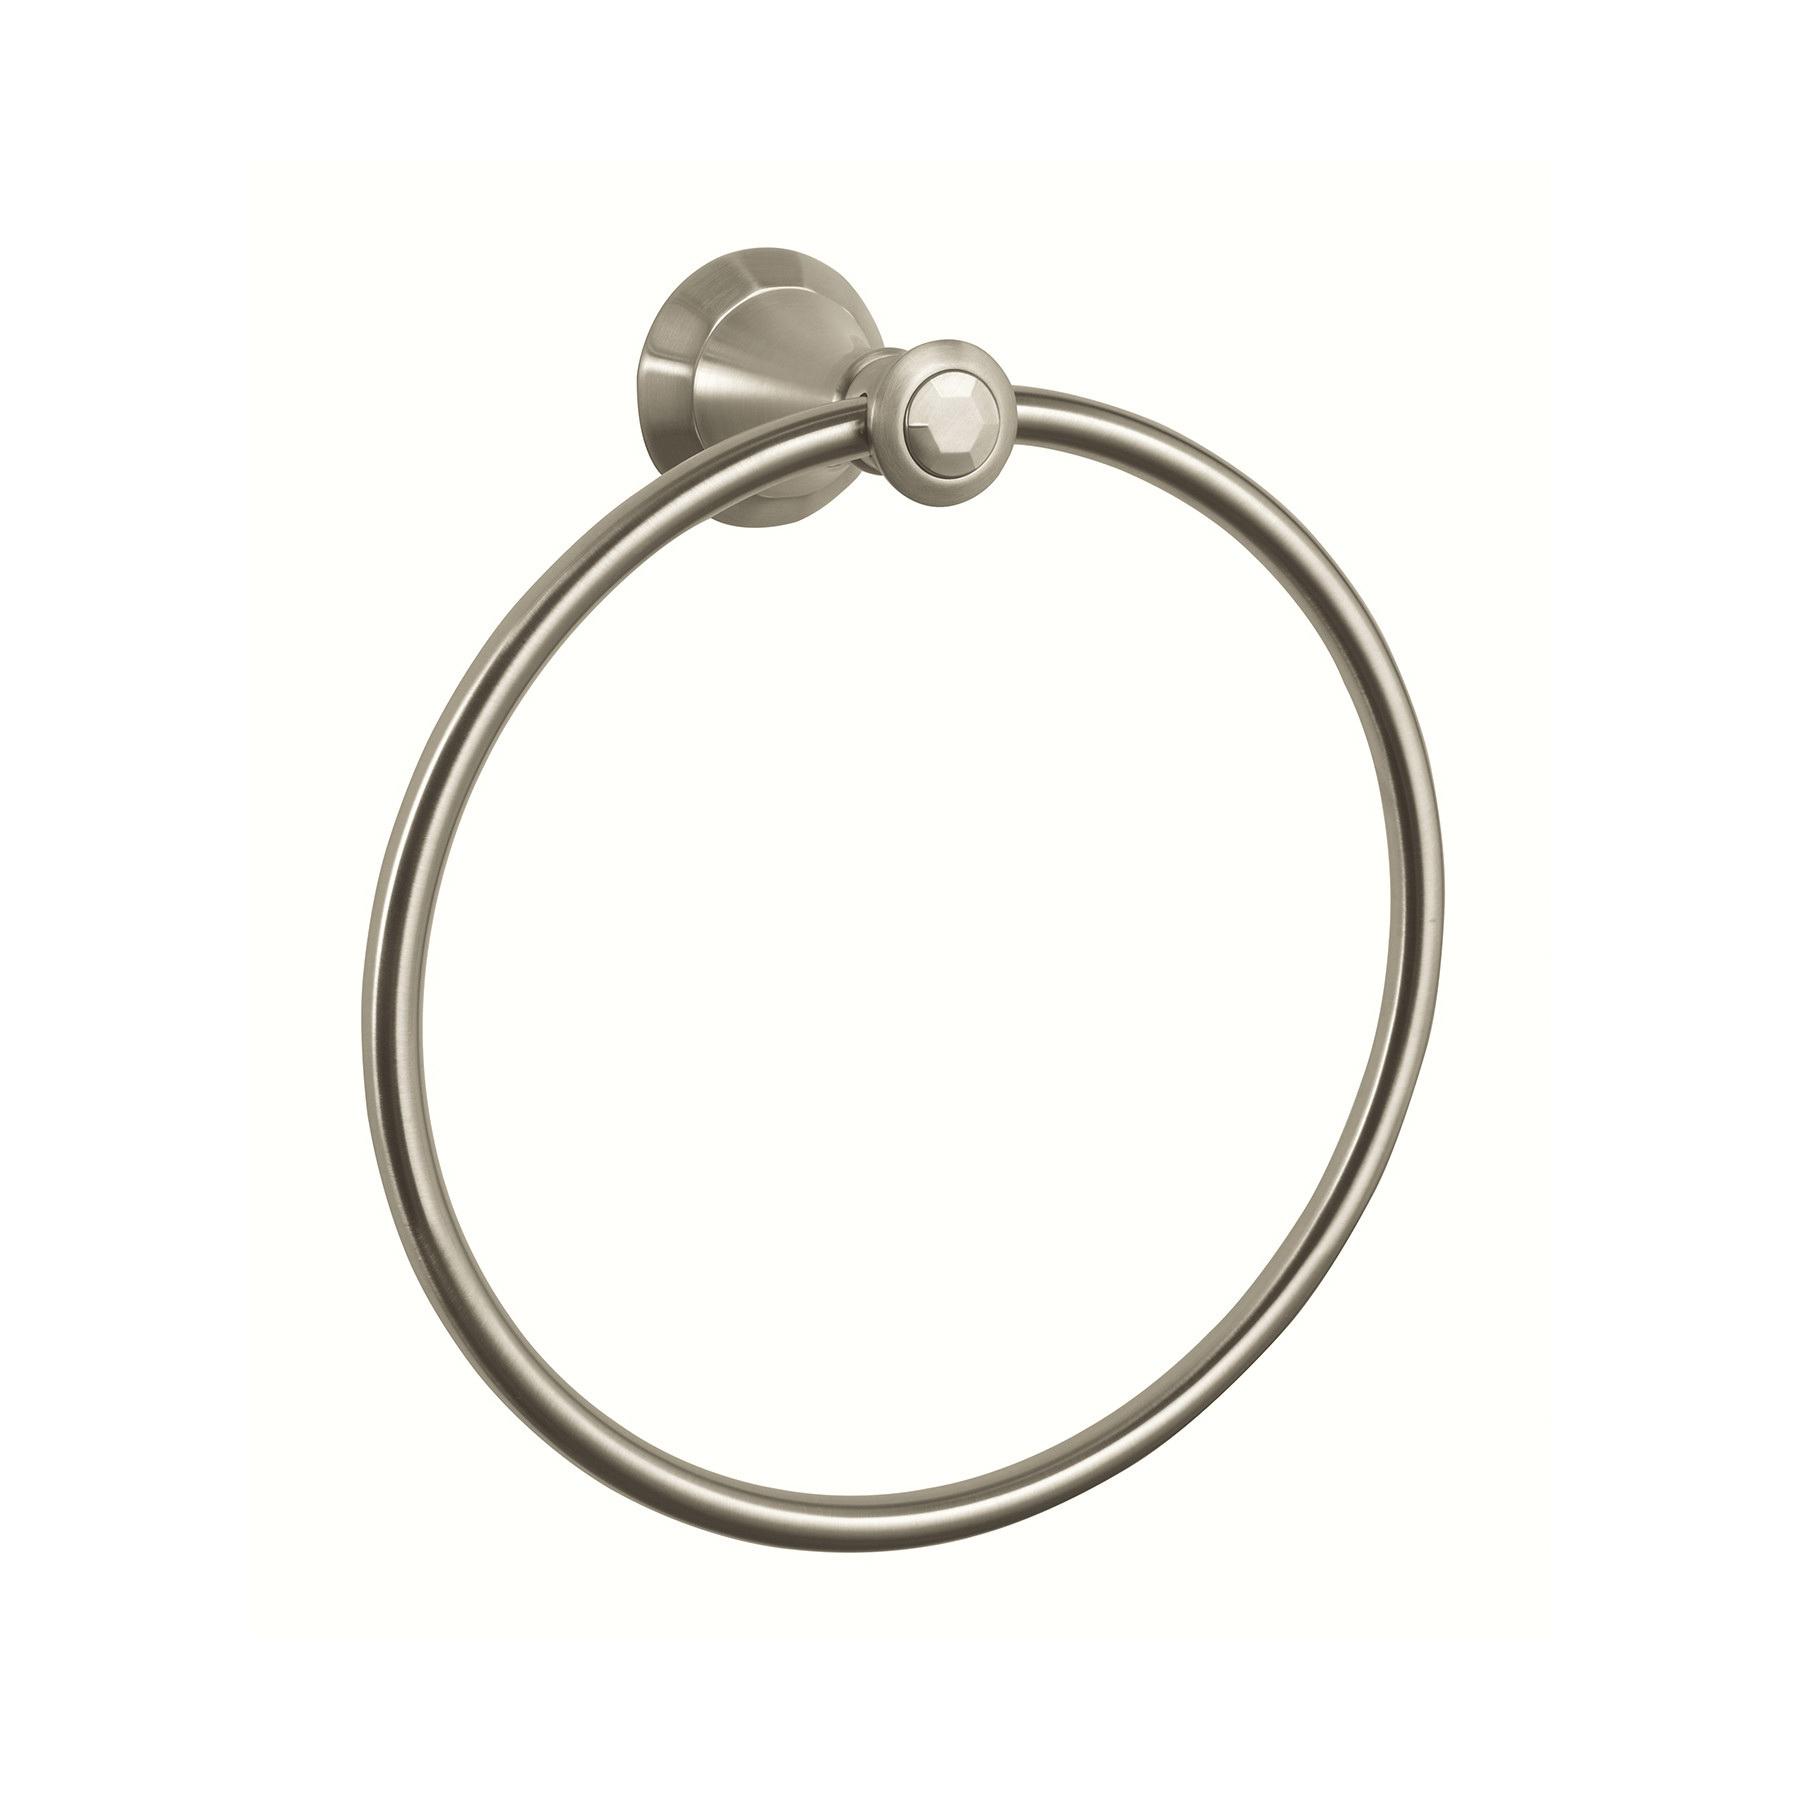 GROHE 40222EN0 Kensington Towel Ring, 7-7/8 in Dia Ring, 2-3/4 in OAD x 8-5/8 in OAH, Metal, Import